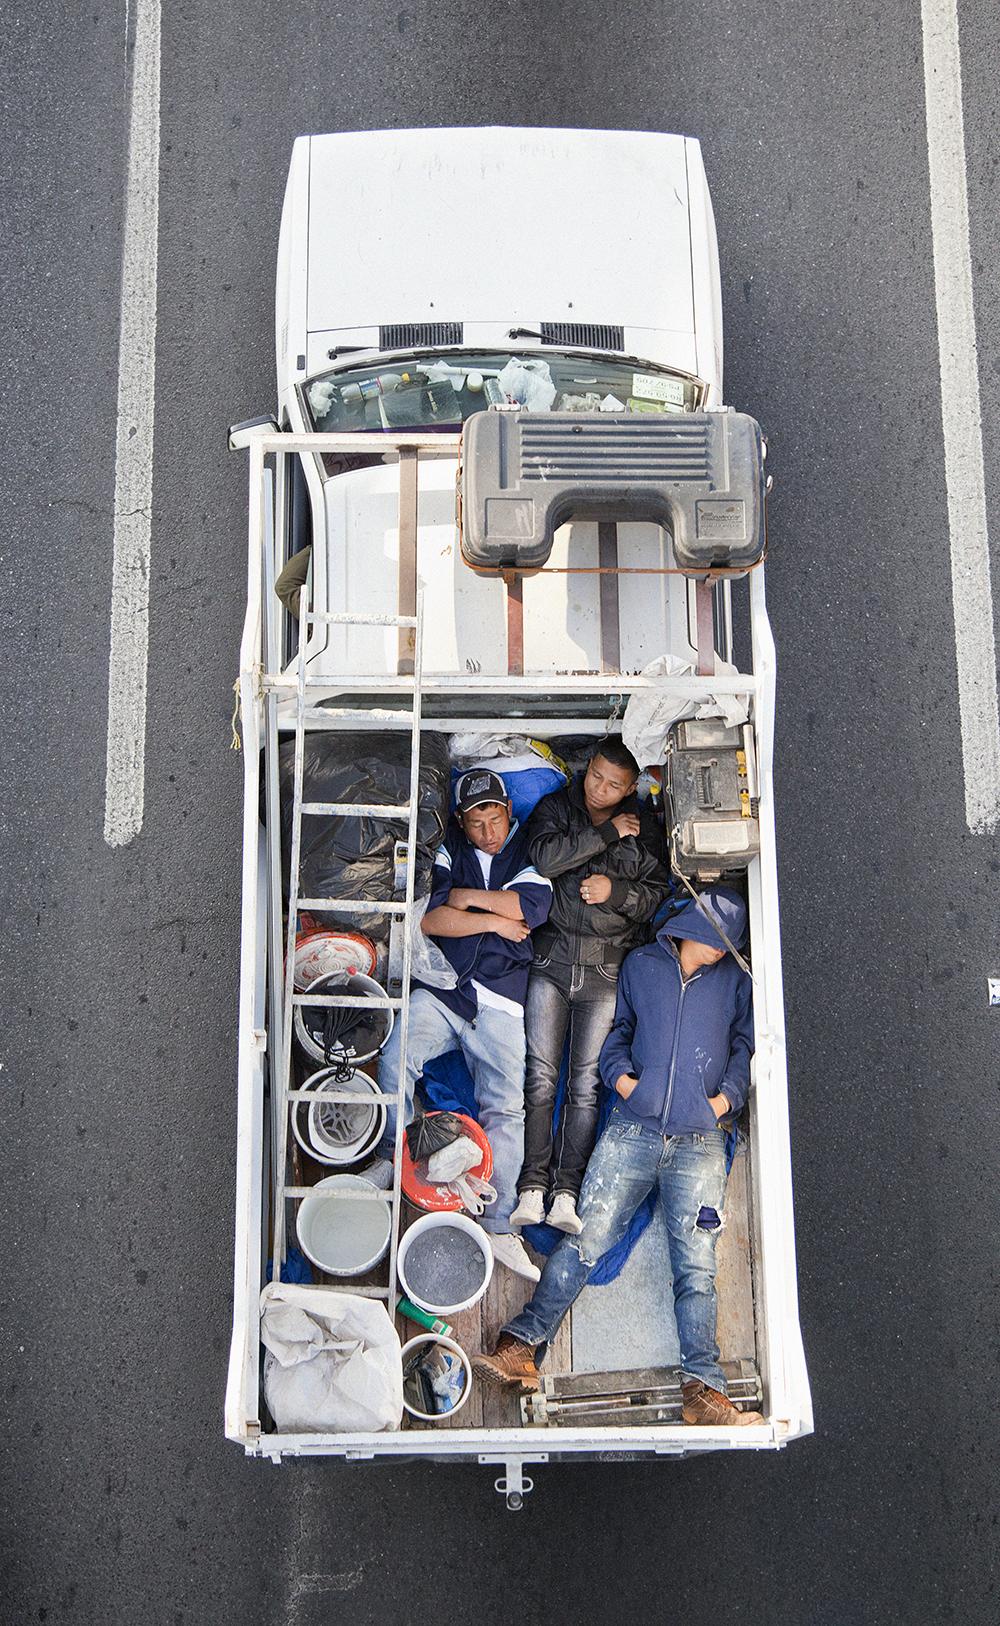 Carpoolers #7, 2011–2012